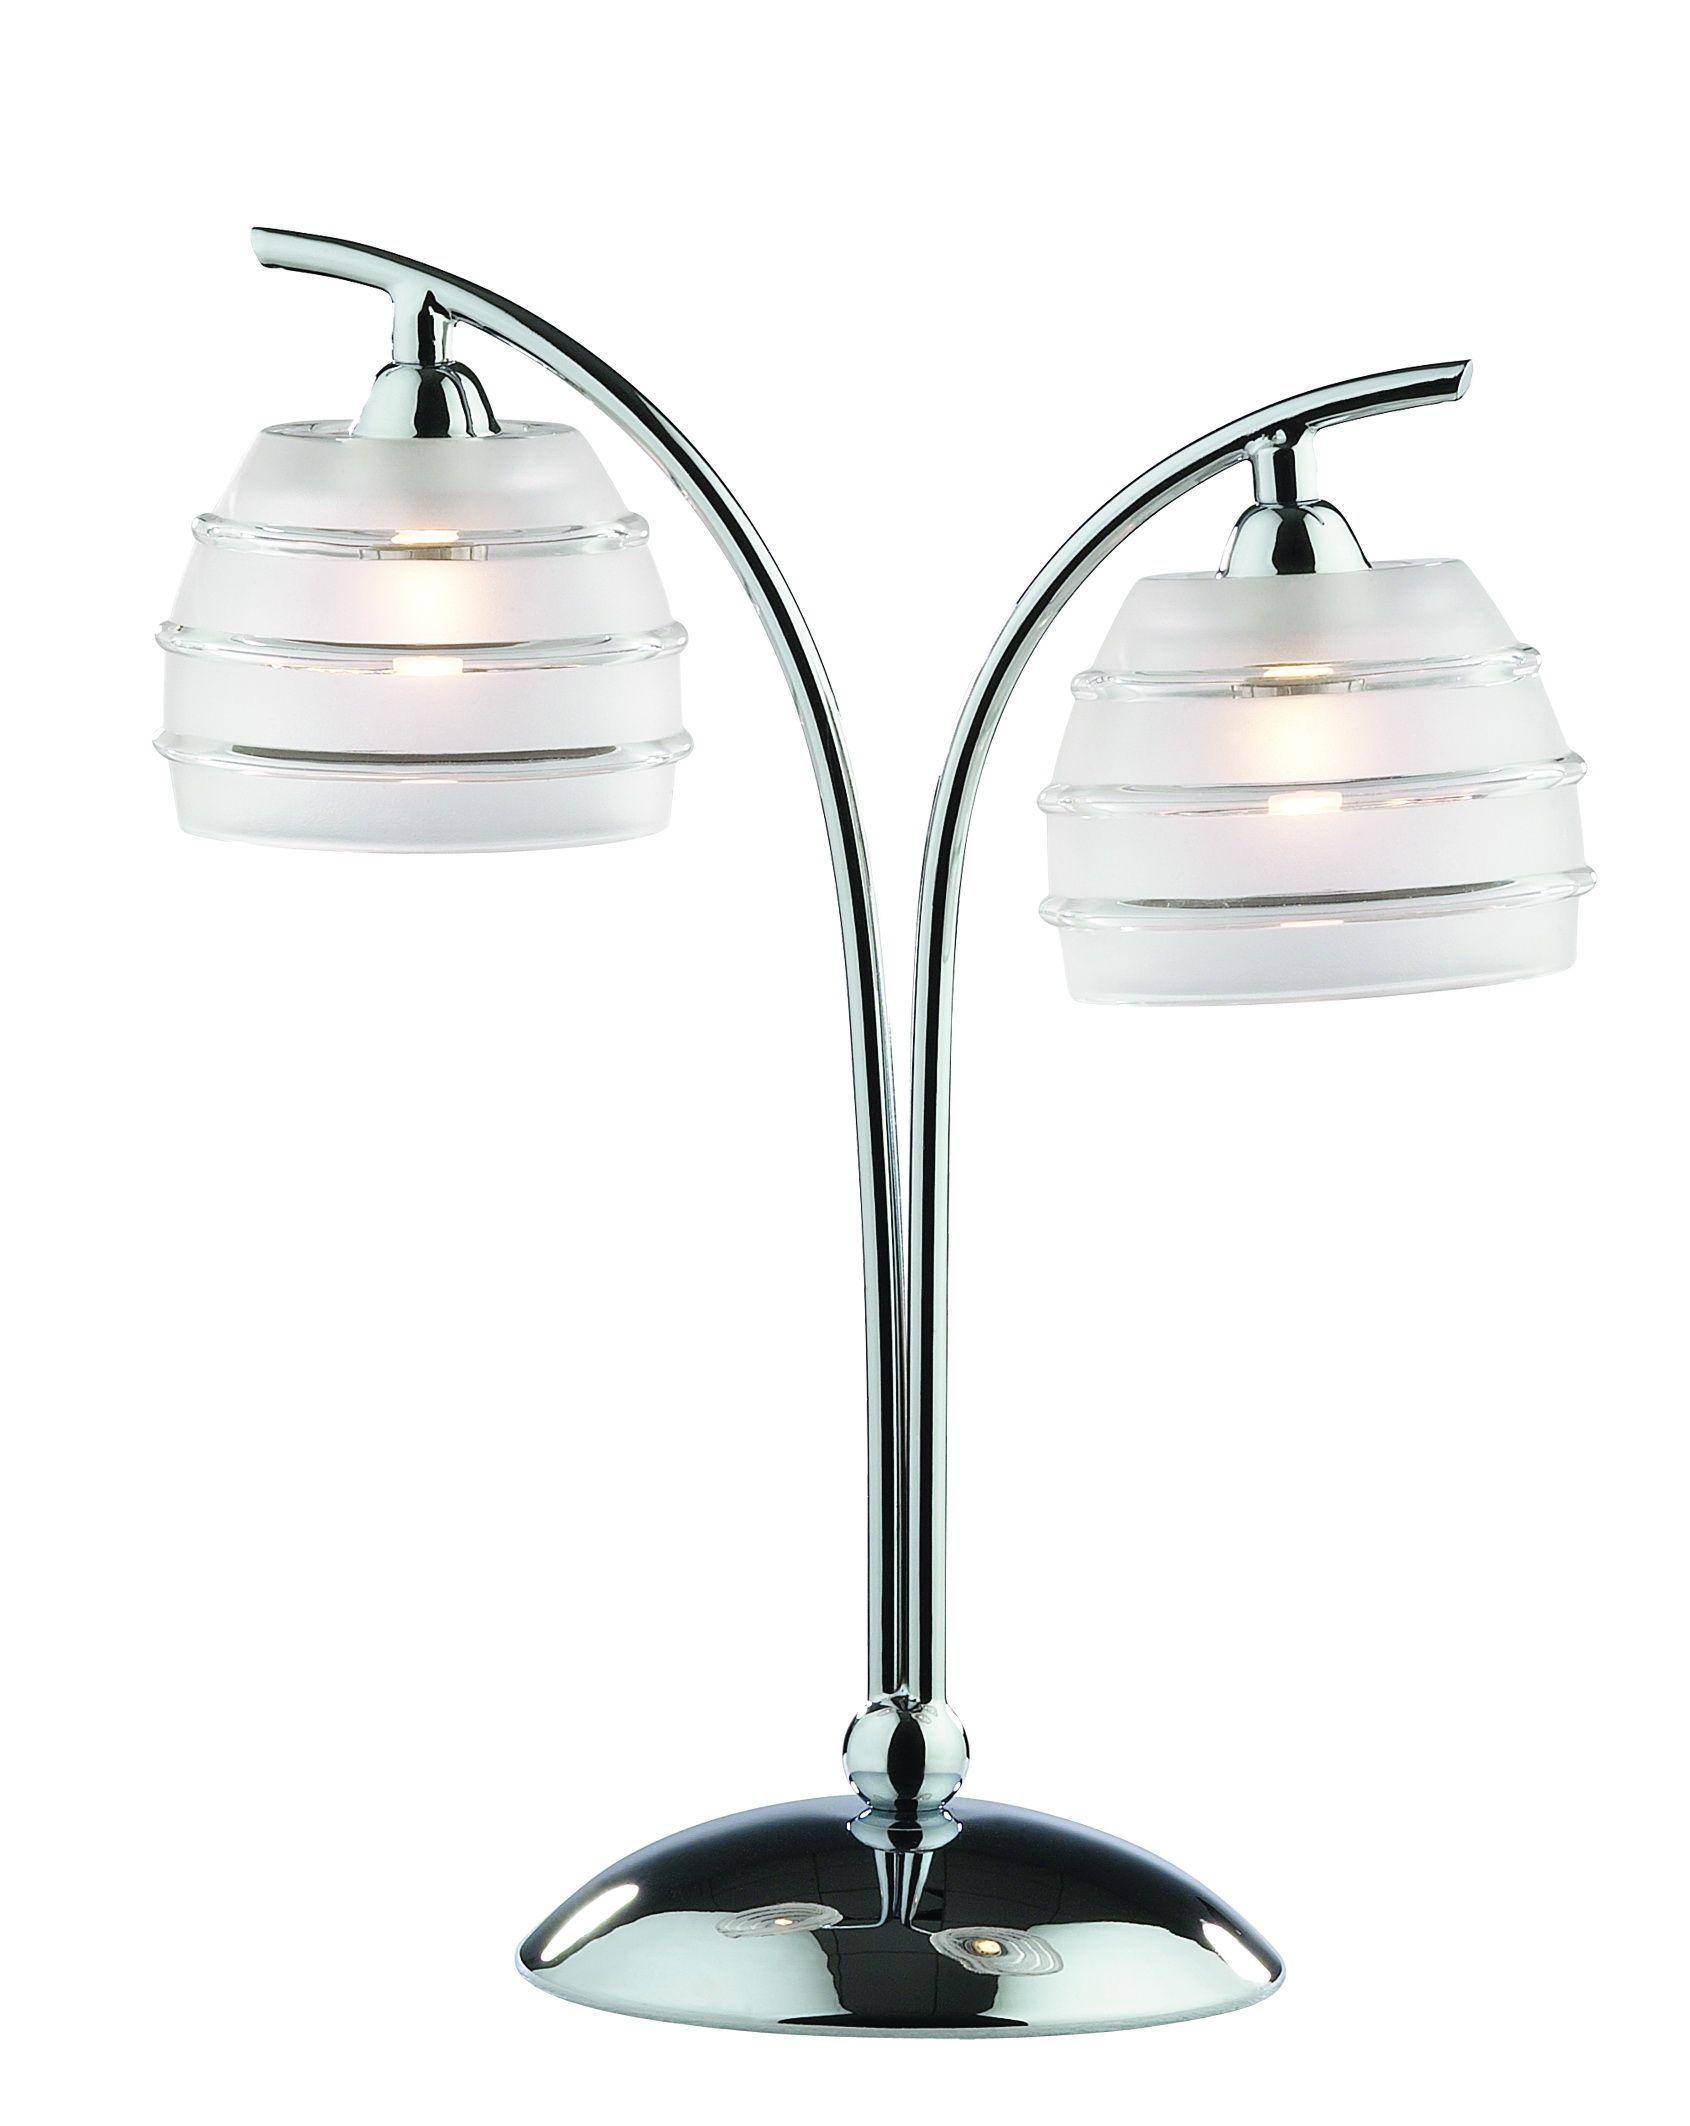 лампа настольная модерн euro-style.kiev.ua фото